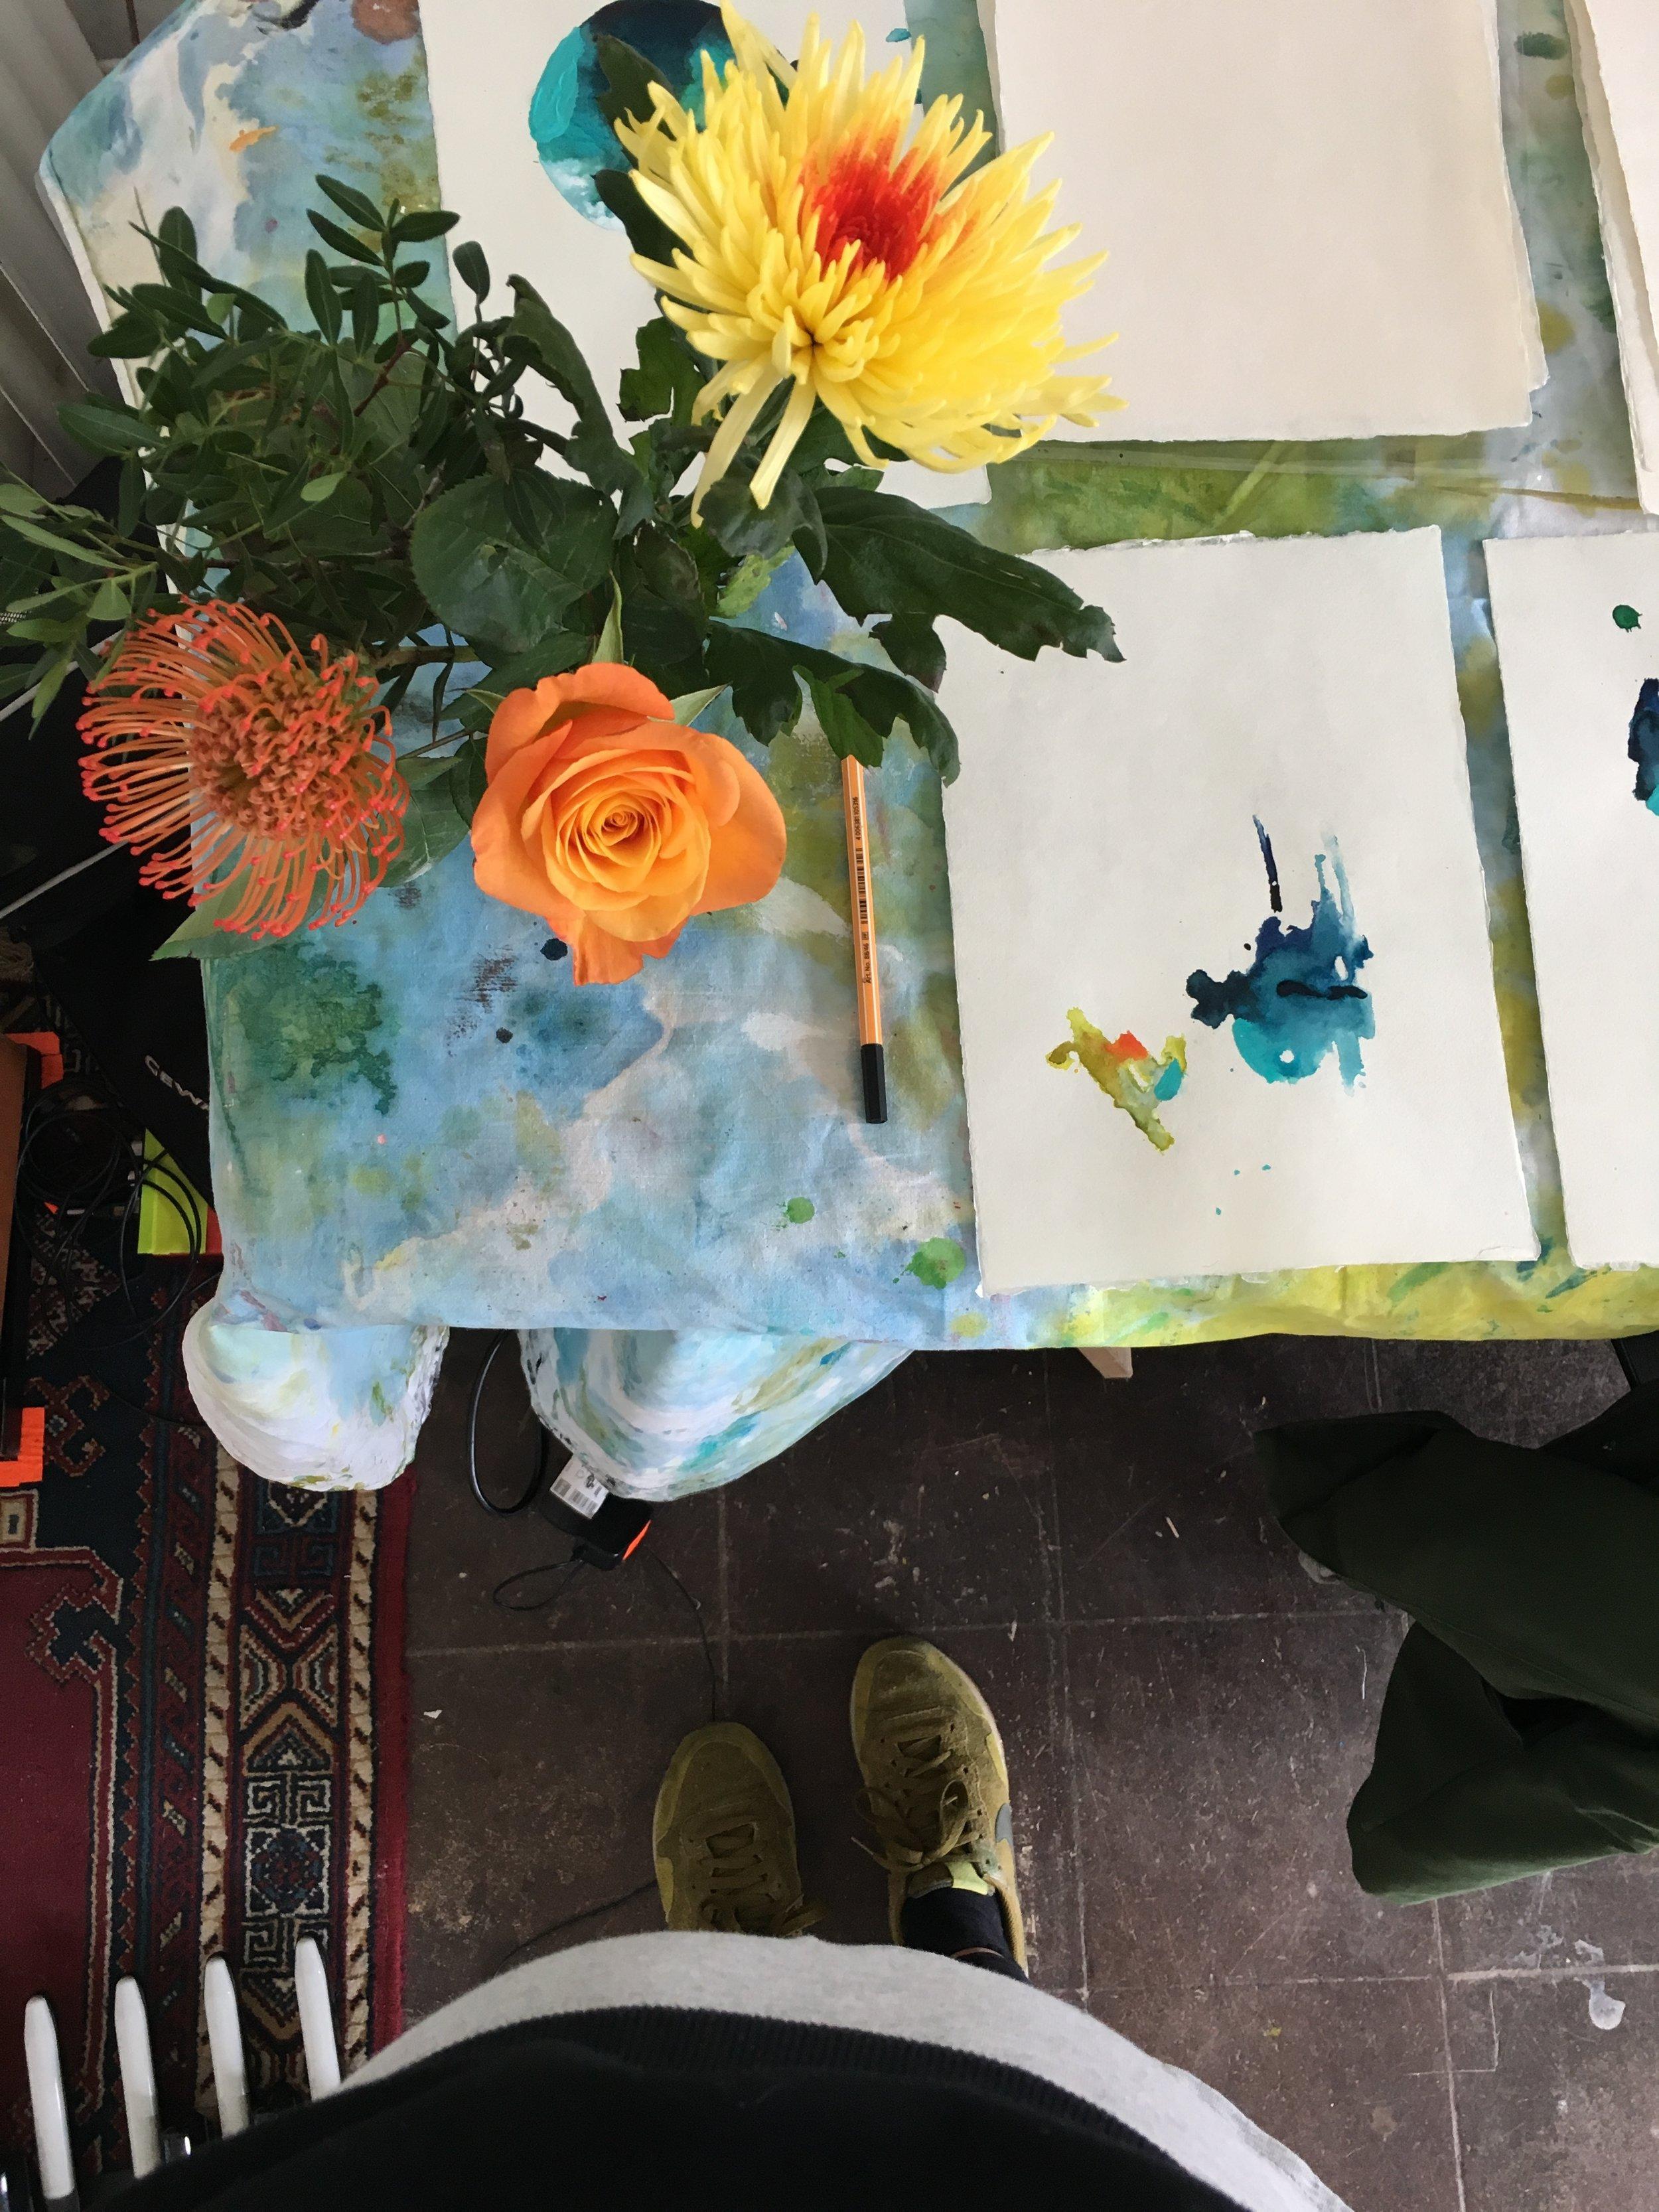 Heidelberg artist, abstract painter